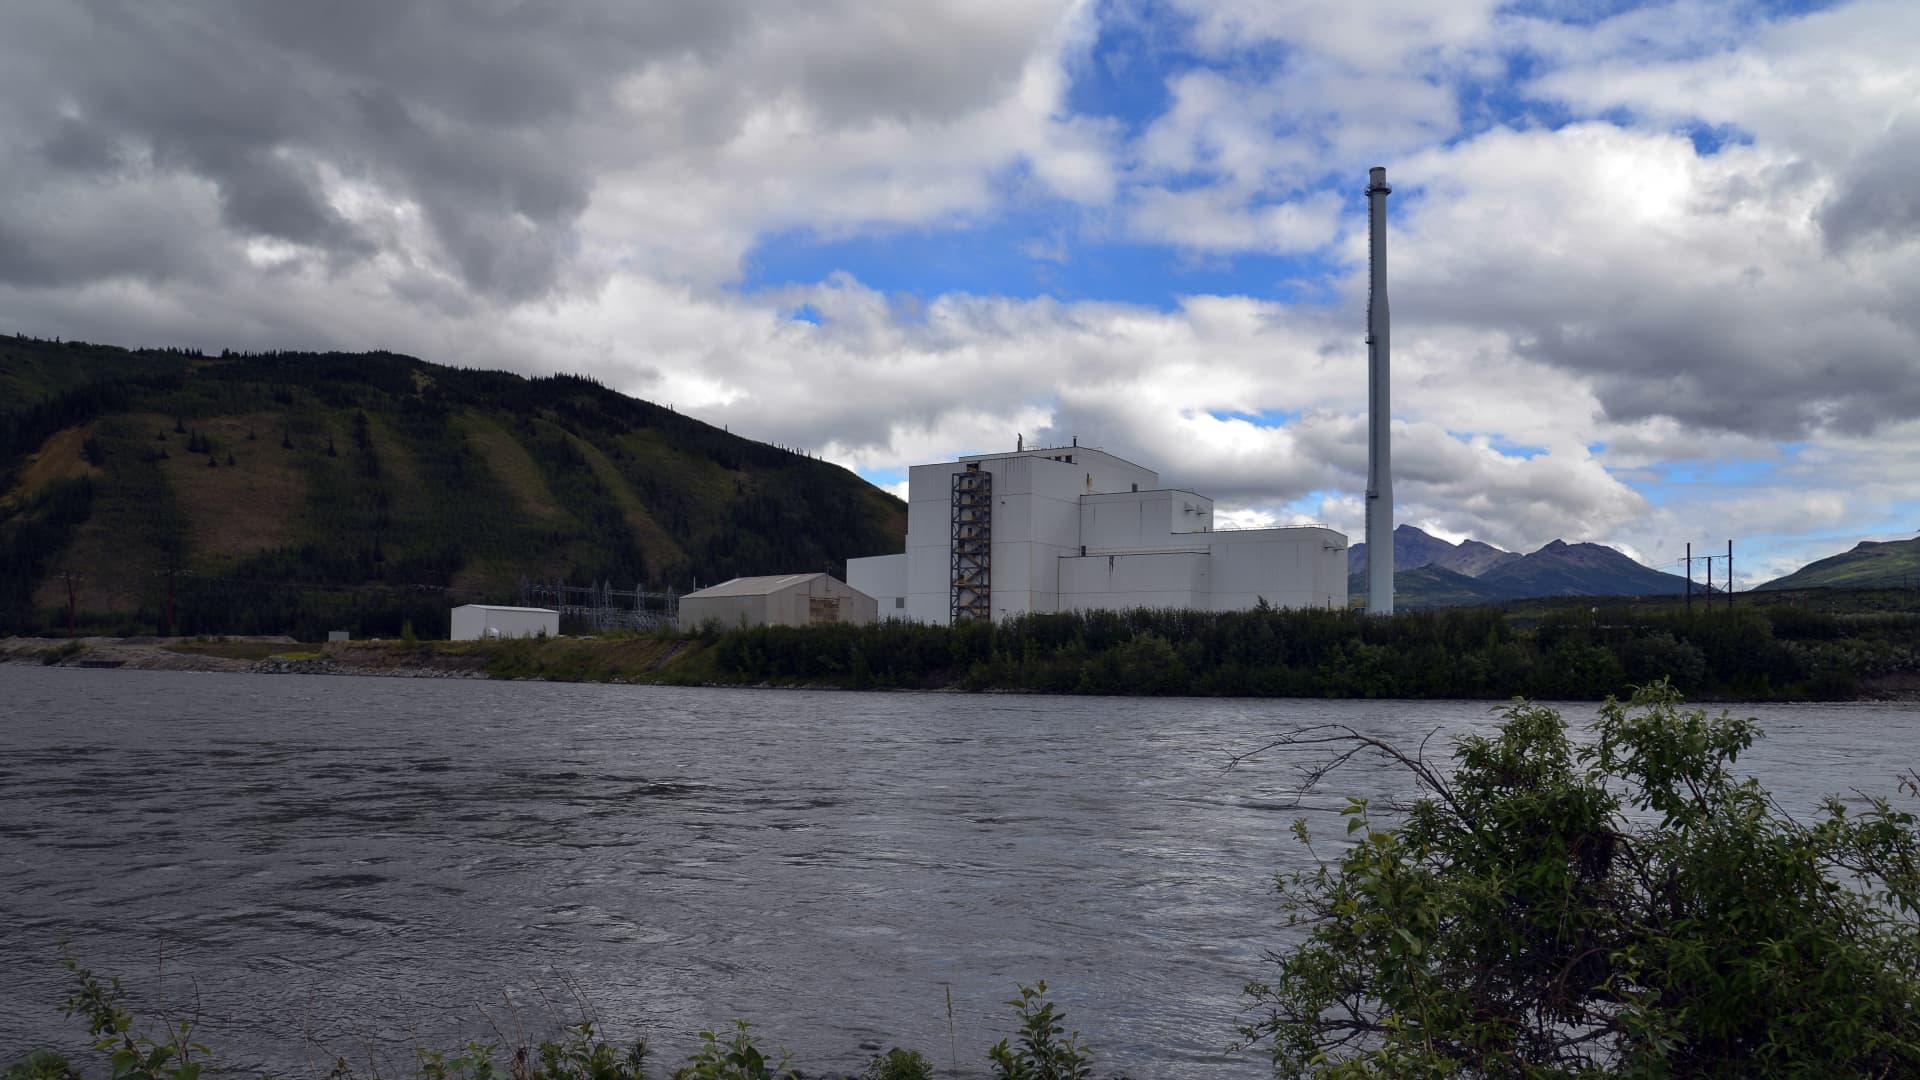 Electric plant on river, near Healy, Alaska.